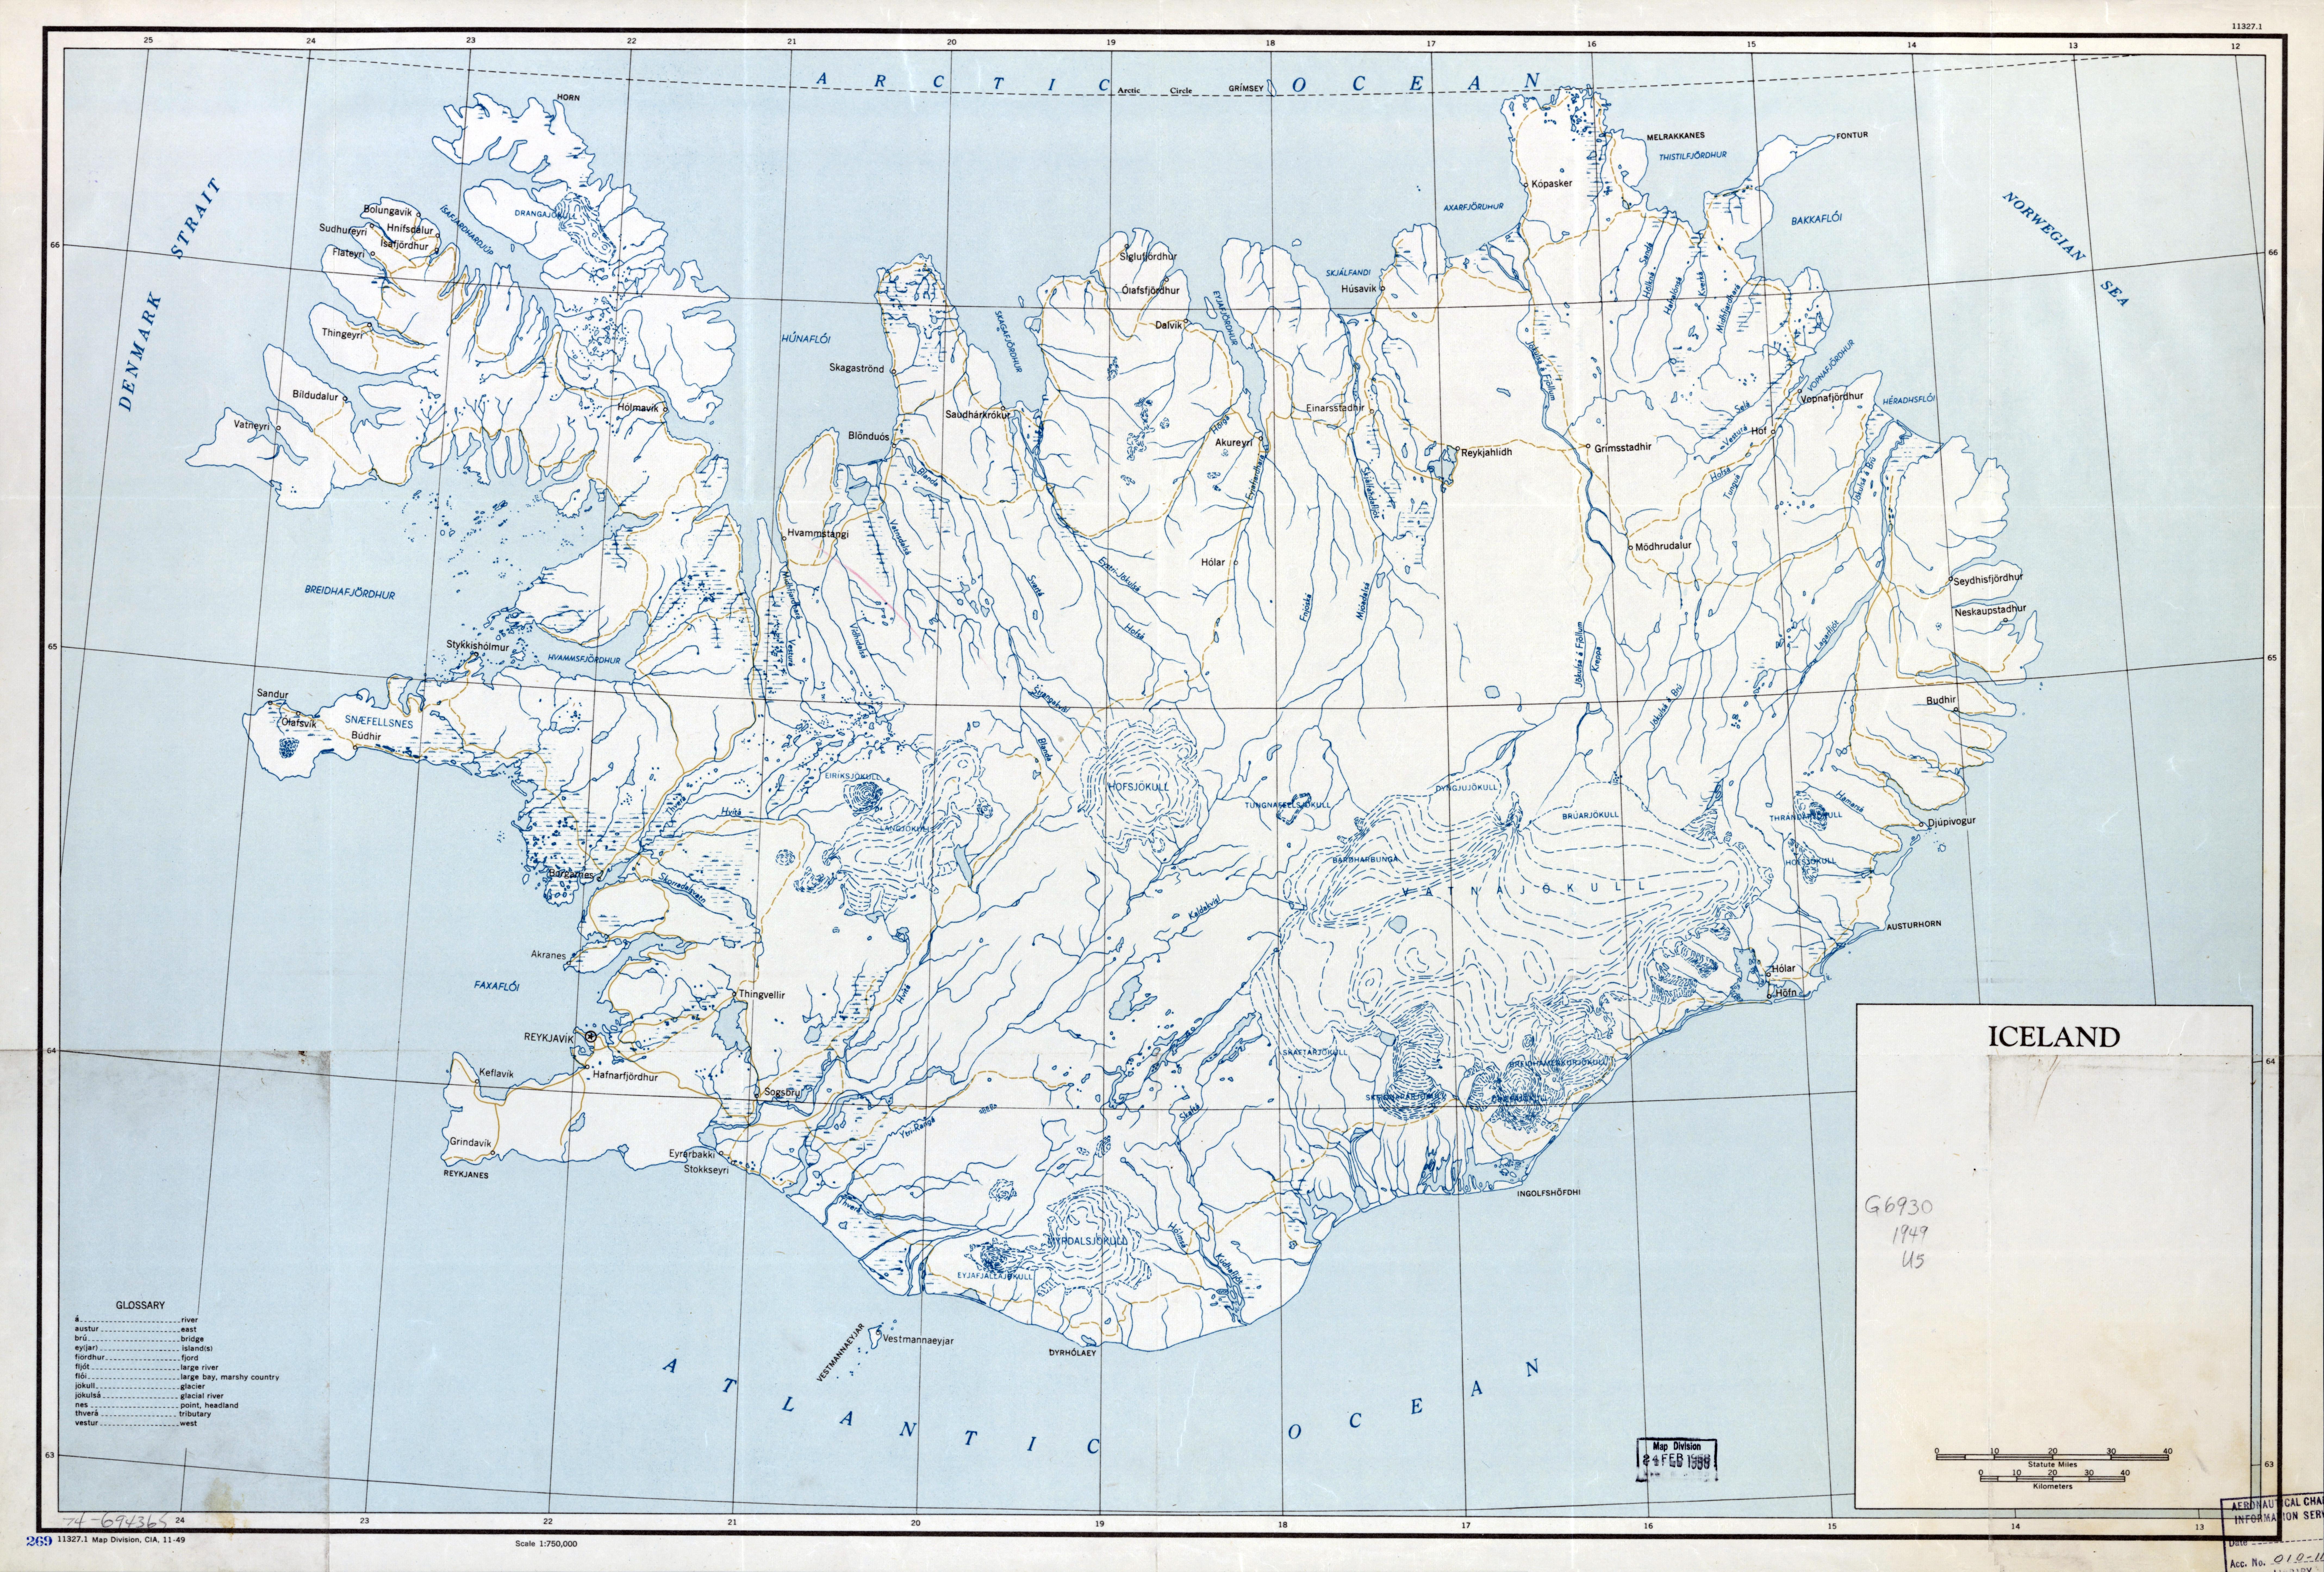 Large scale old map of iceland 1949 iceland europe large scale old map of iceland 1949 gumiabroncs Images